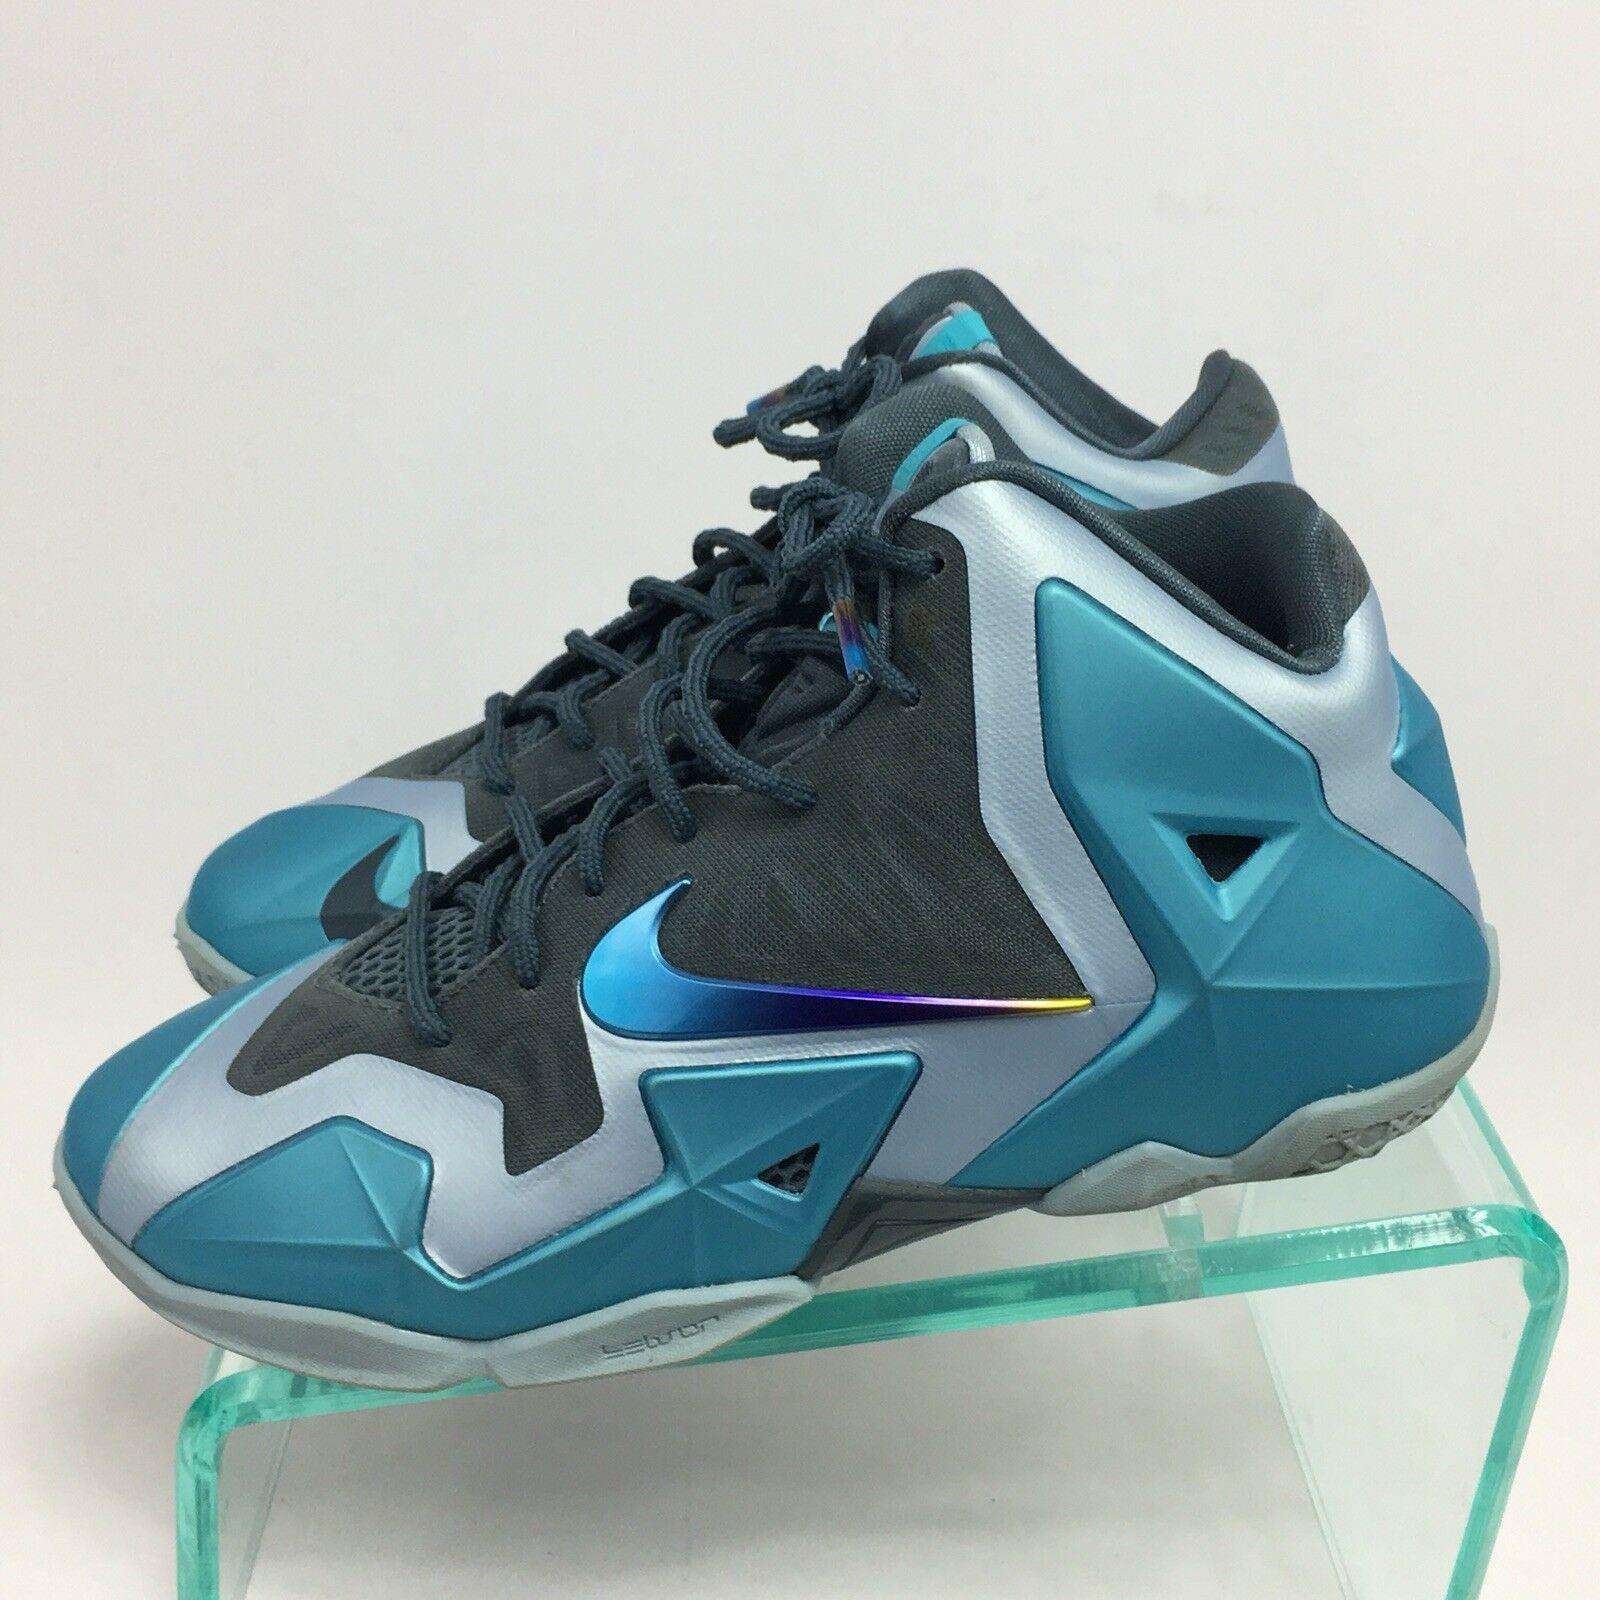 Nike Sneakers Lebron James Armory Slate Gamma Blue 7Y 621712-400 Tennis Shoes